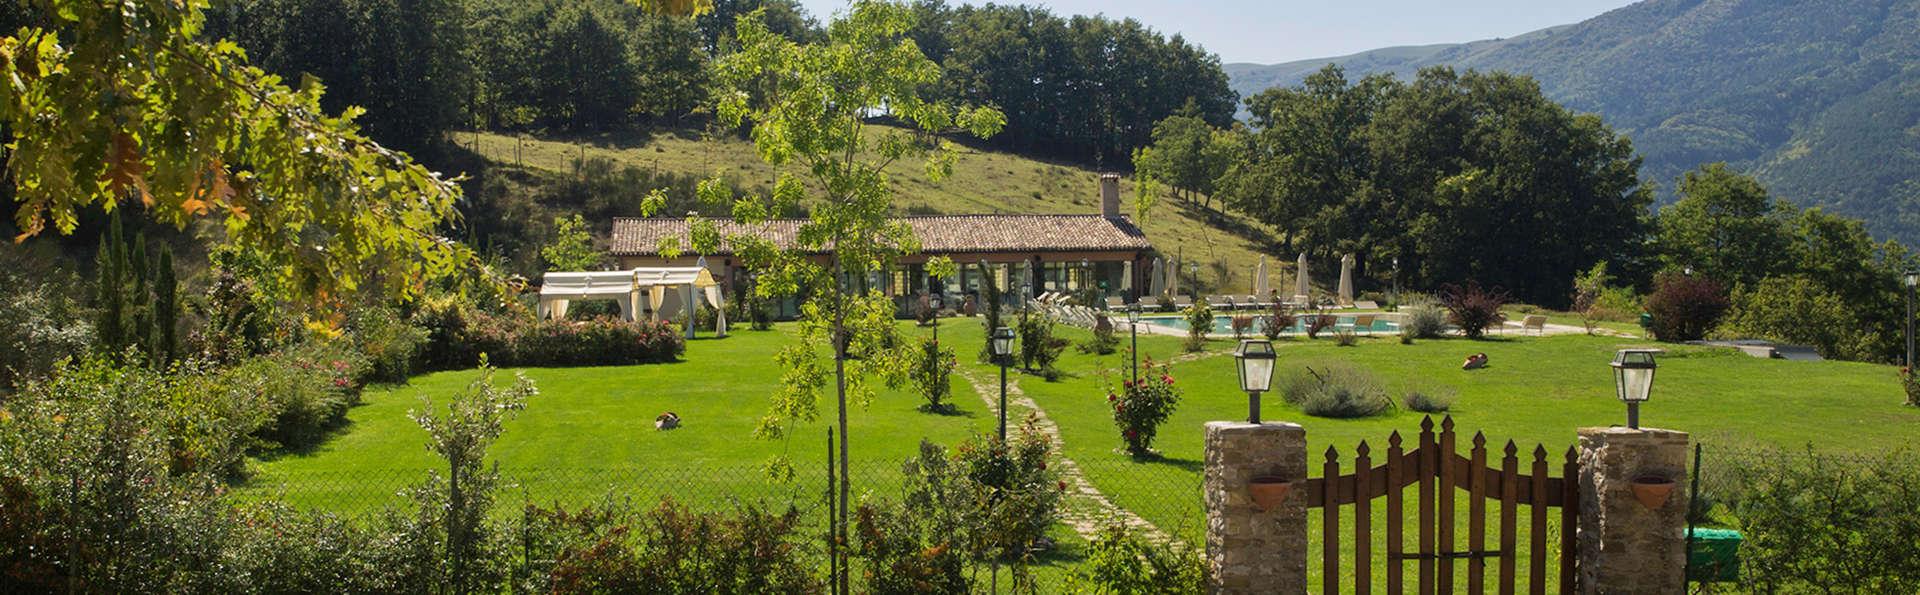 Le Silve di Armenzano - Residenza d'Epoca - Edit_Front3.jpg